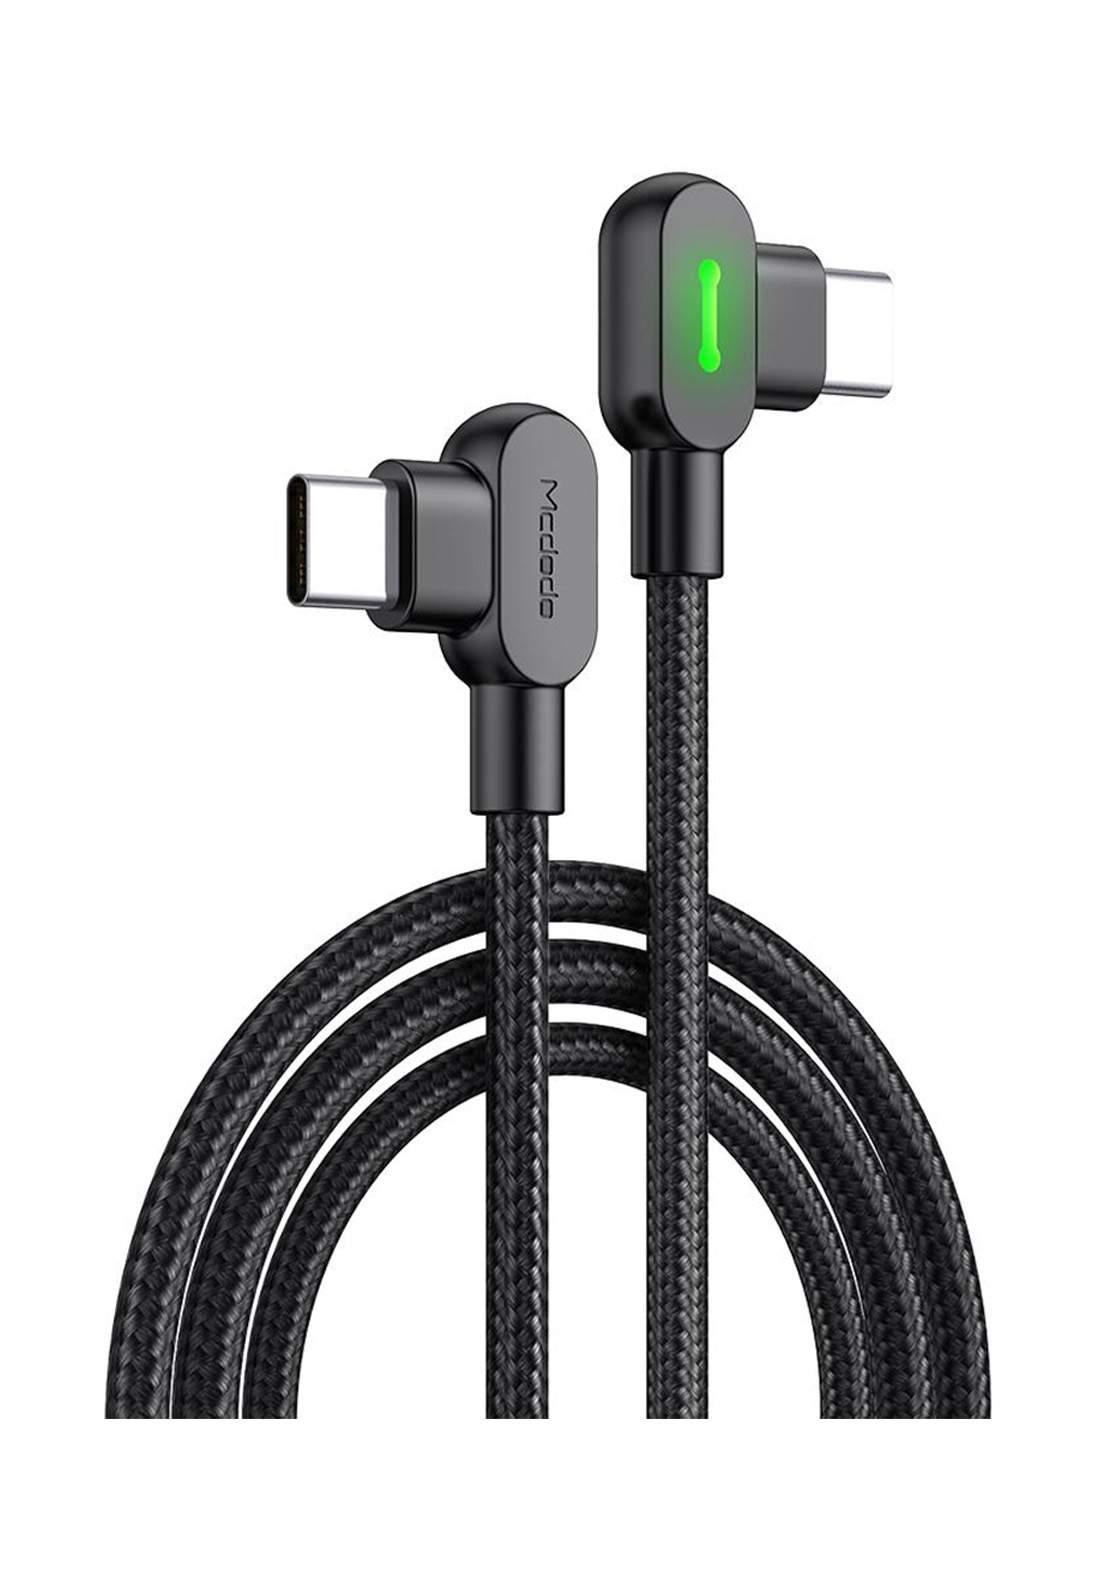 (3394)Mcdodo CA08080 USB Type-C to USB Type-C Cable 1.5 m - Black كابل